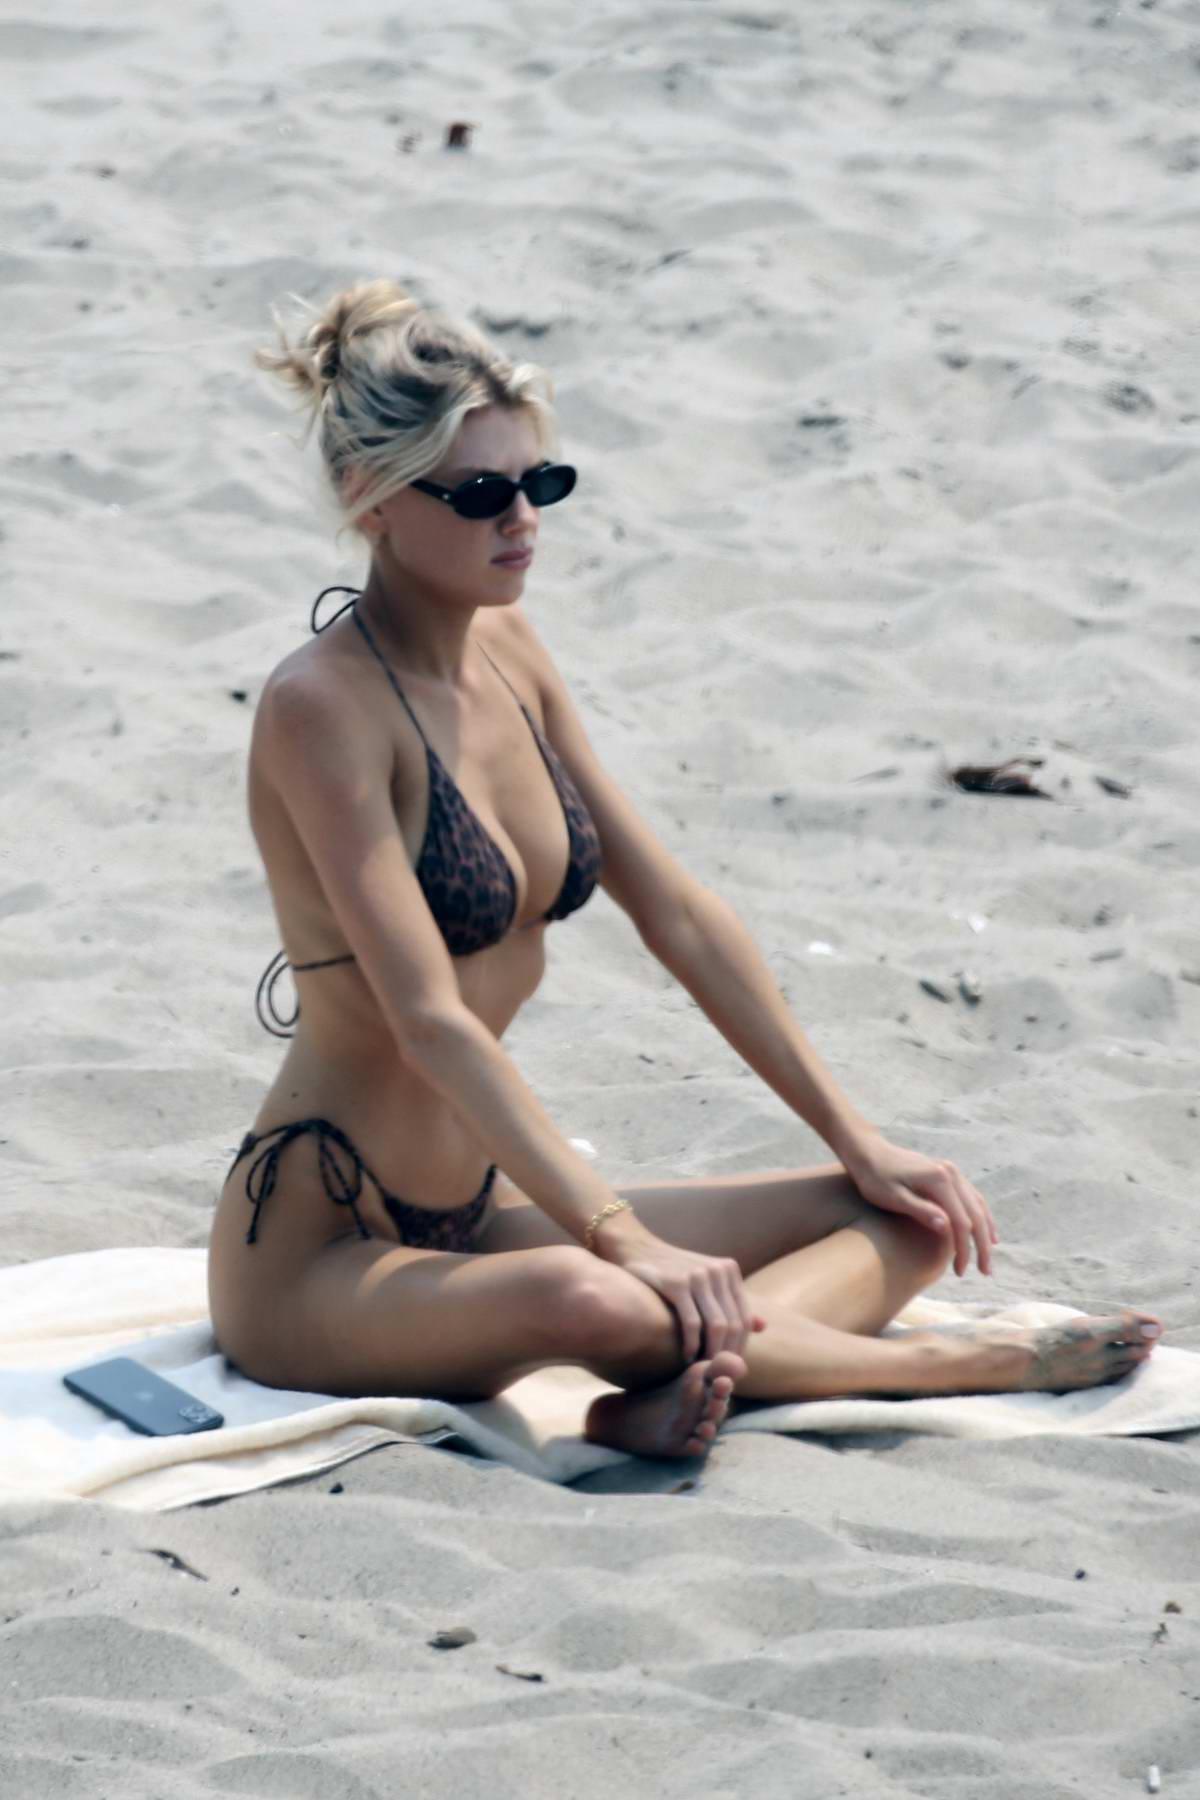 Charlotte McKinney shows off her beach body in an animal print bikini while relaxing at the beach in Malibu, California